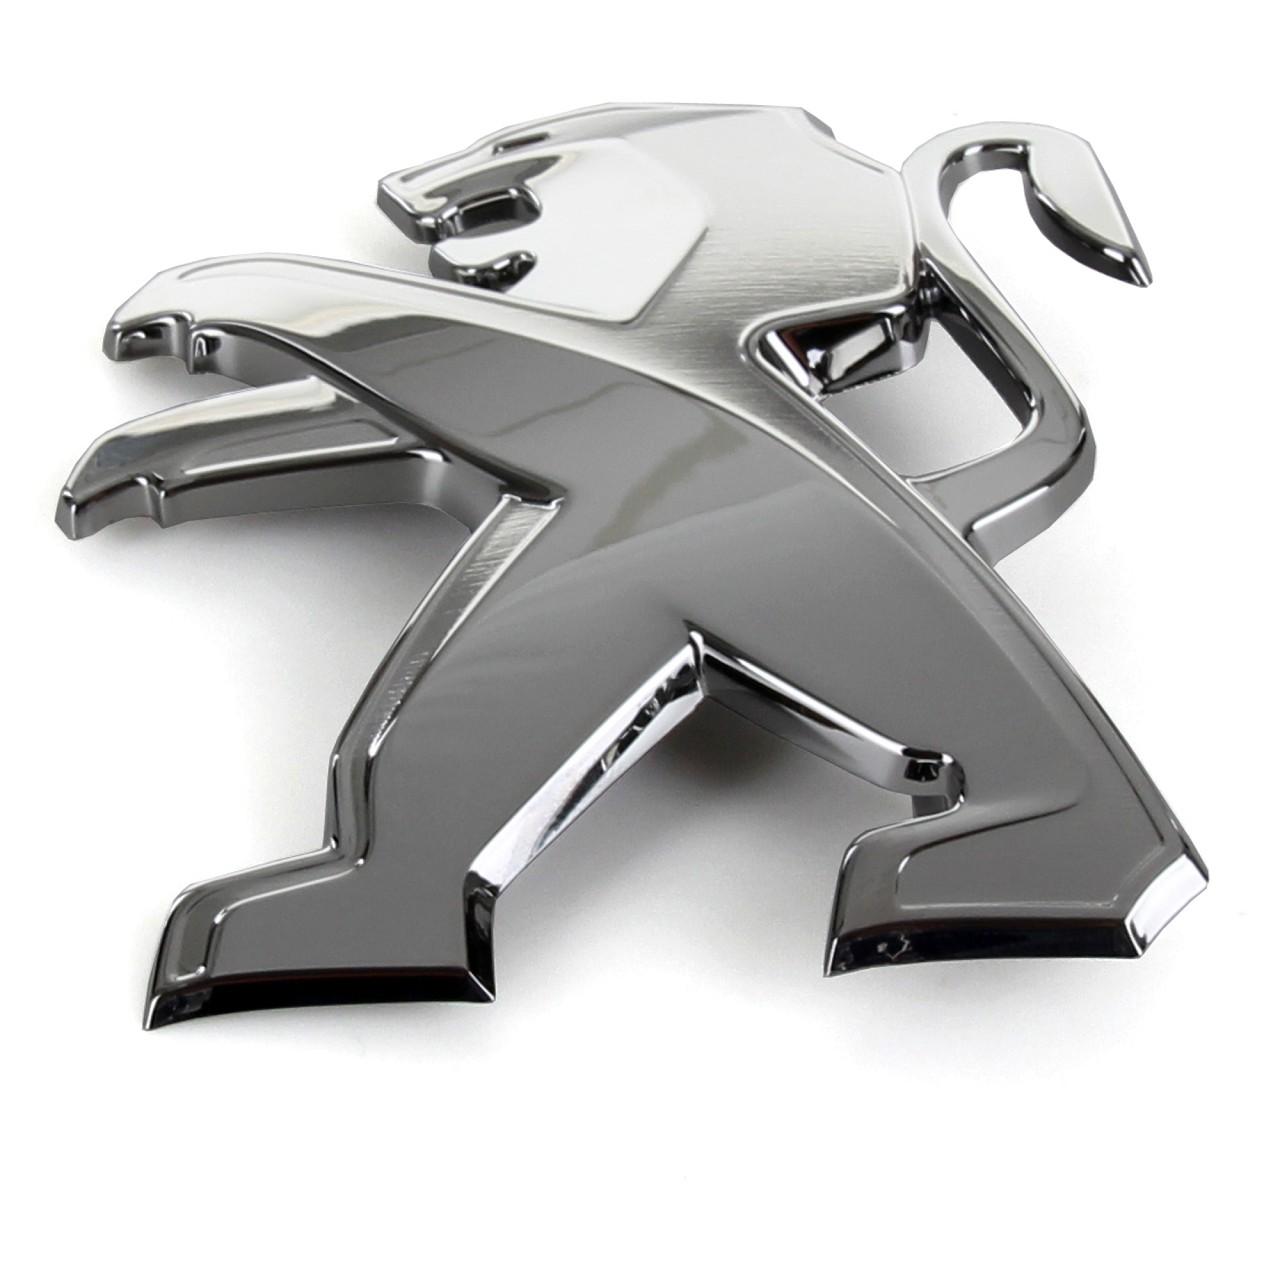 ORIGINAL Peugeot Emblem Plakette Logo LÖWE hinten Heckklappe 9673873280 für 208